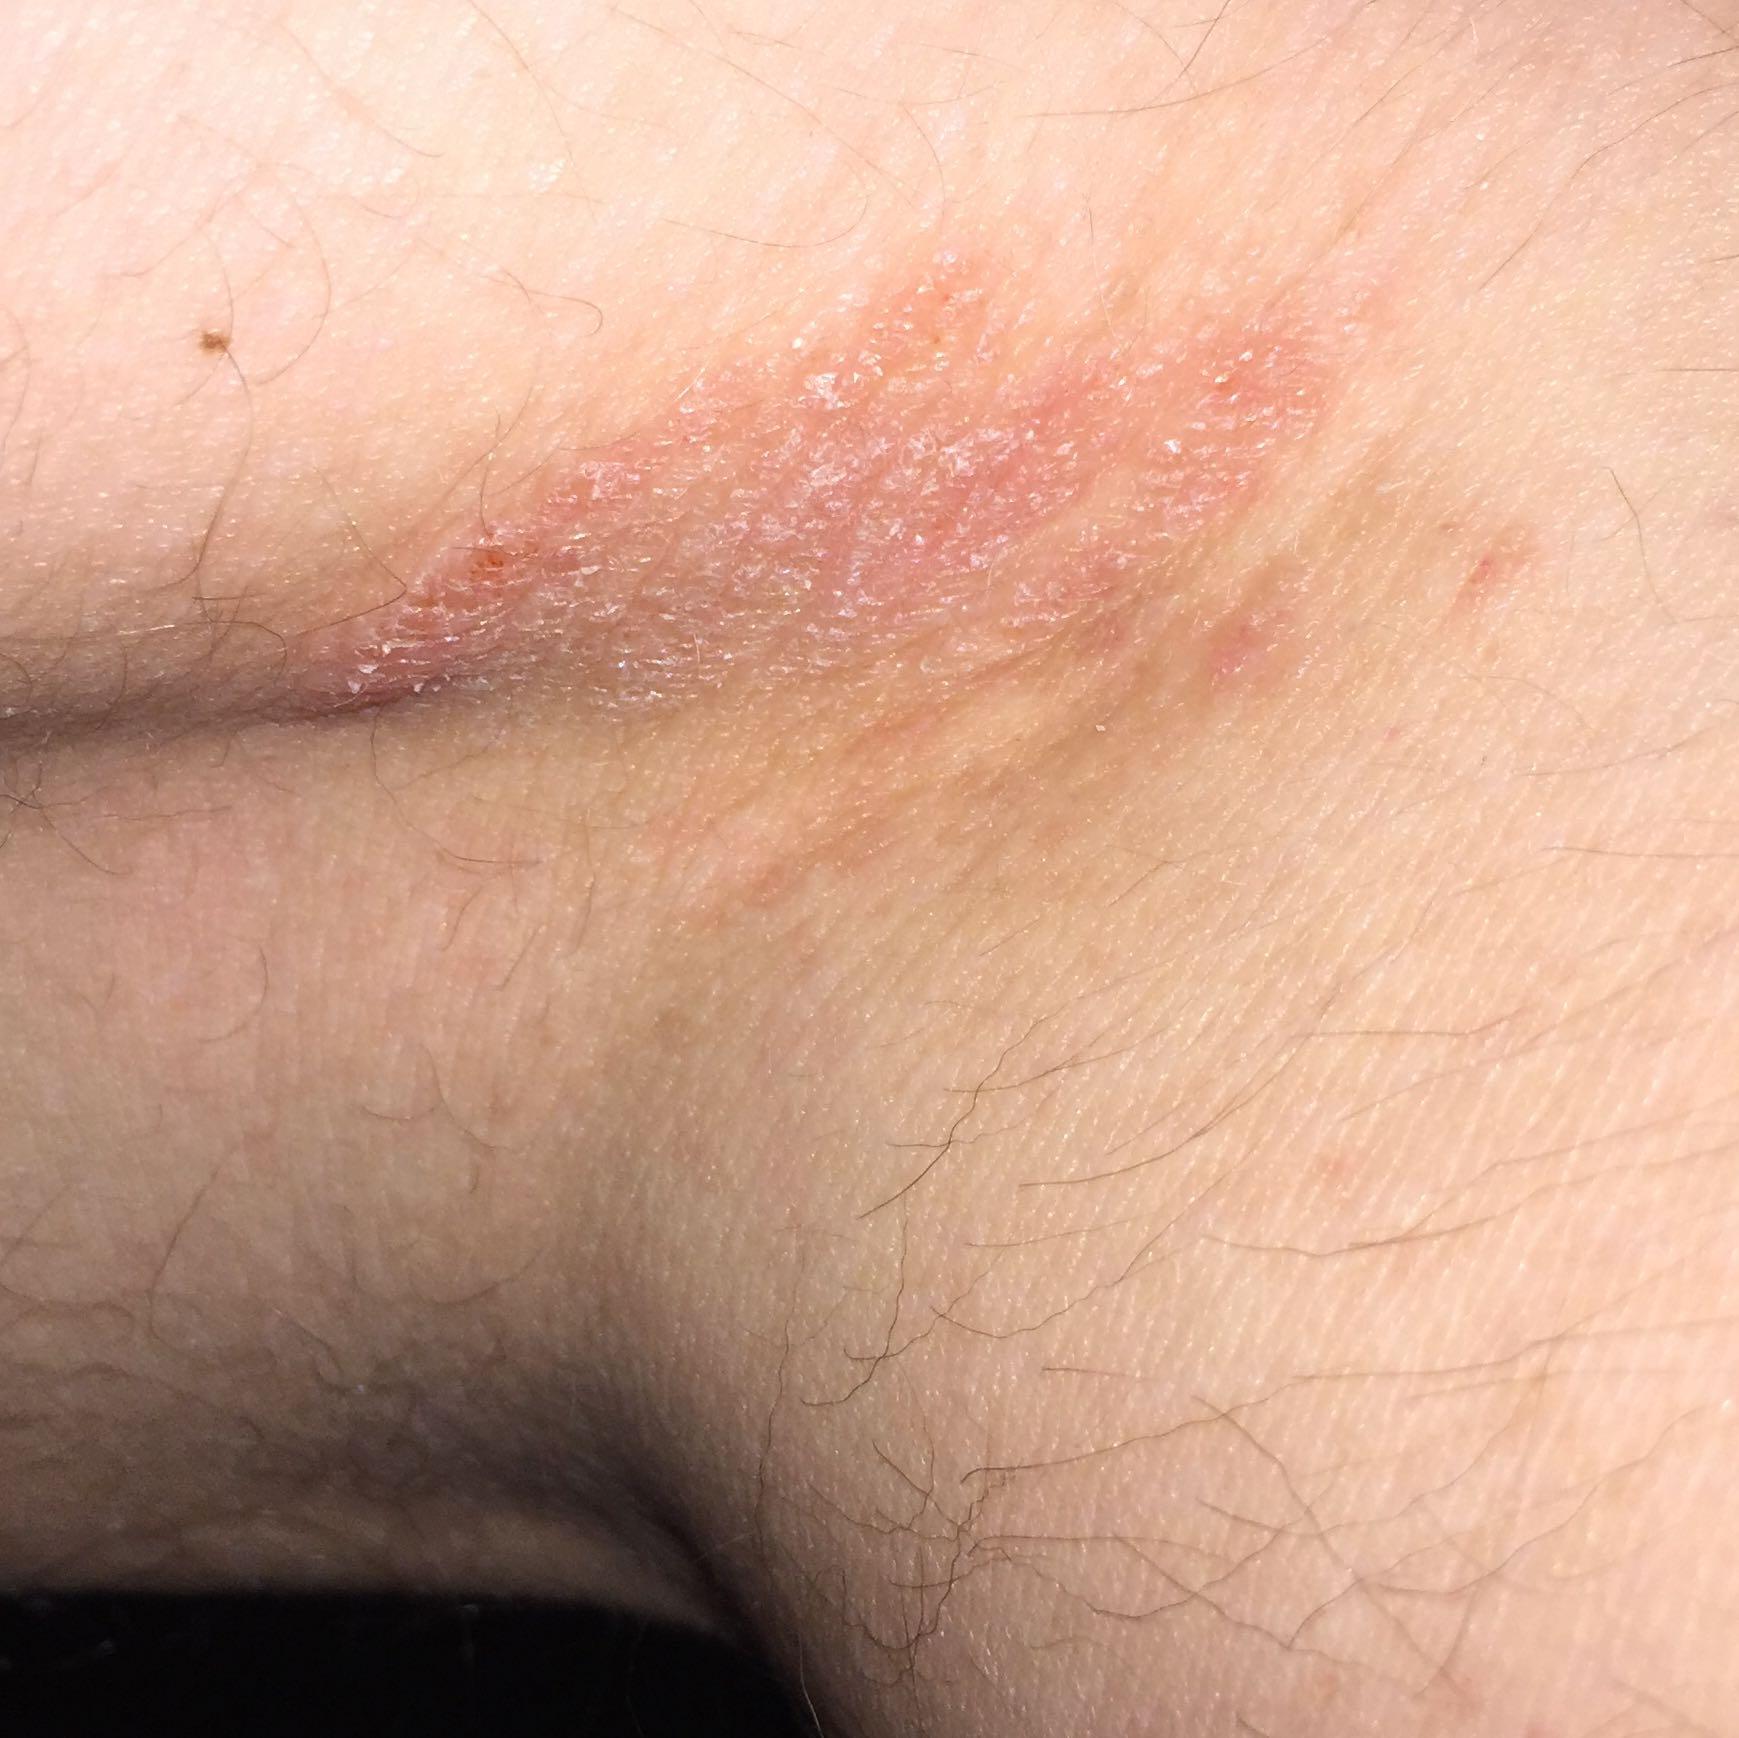 Gerötete juckende stelle (Medizin, Arzt, Haut)